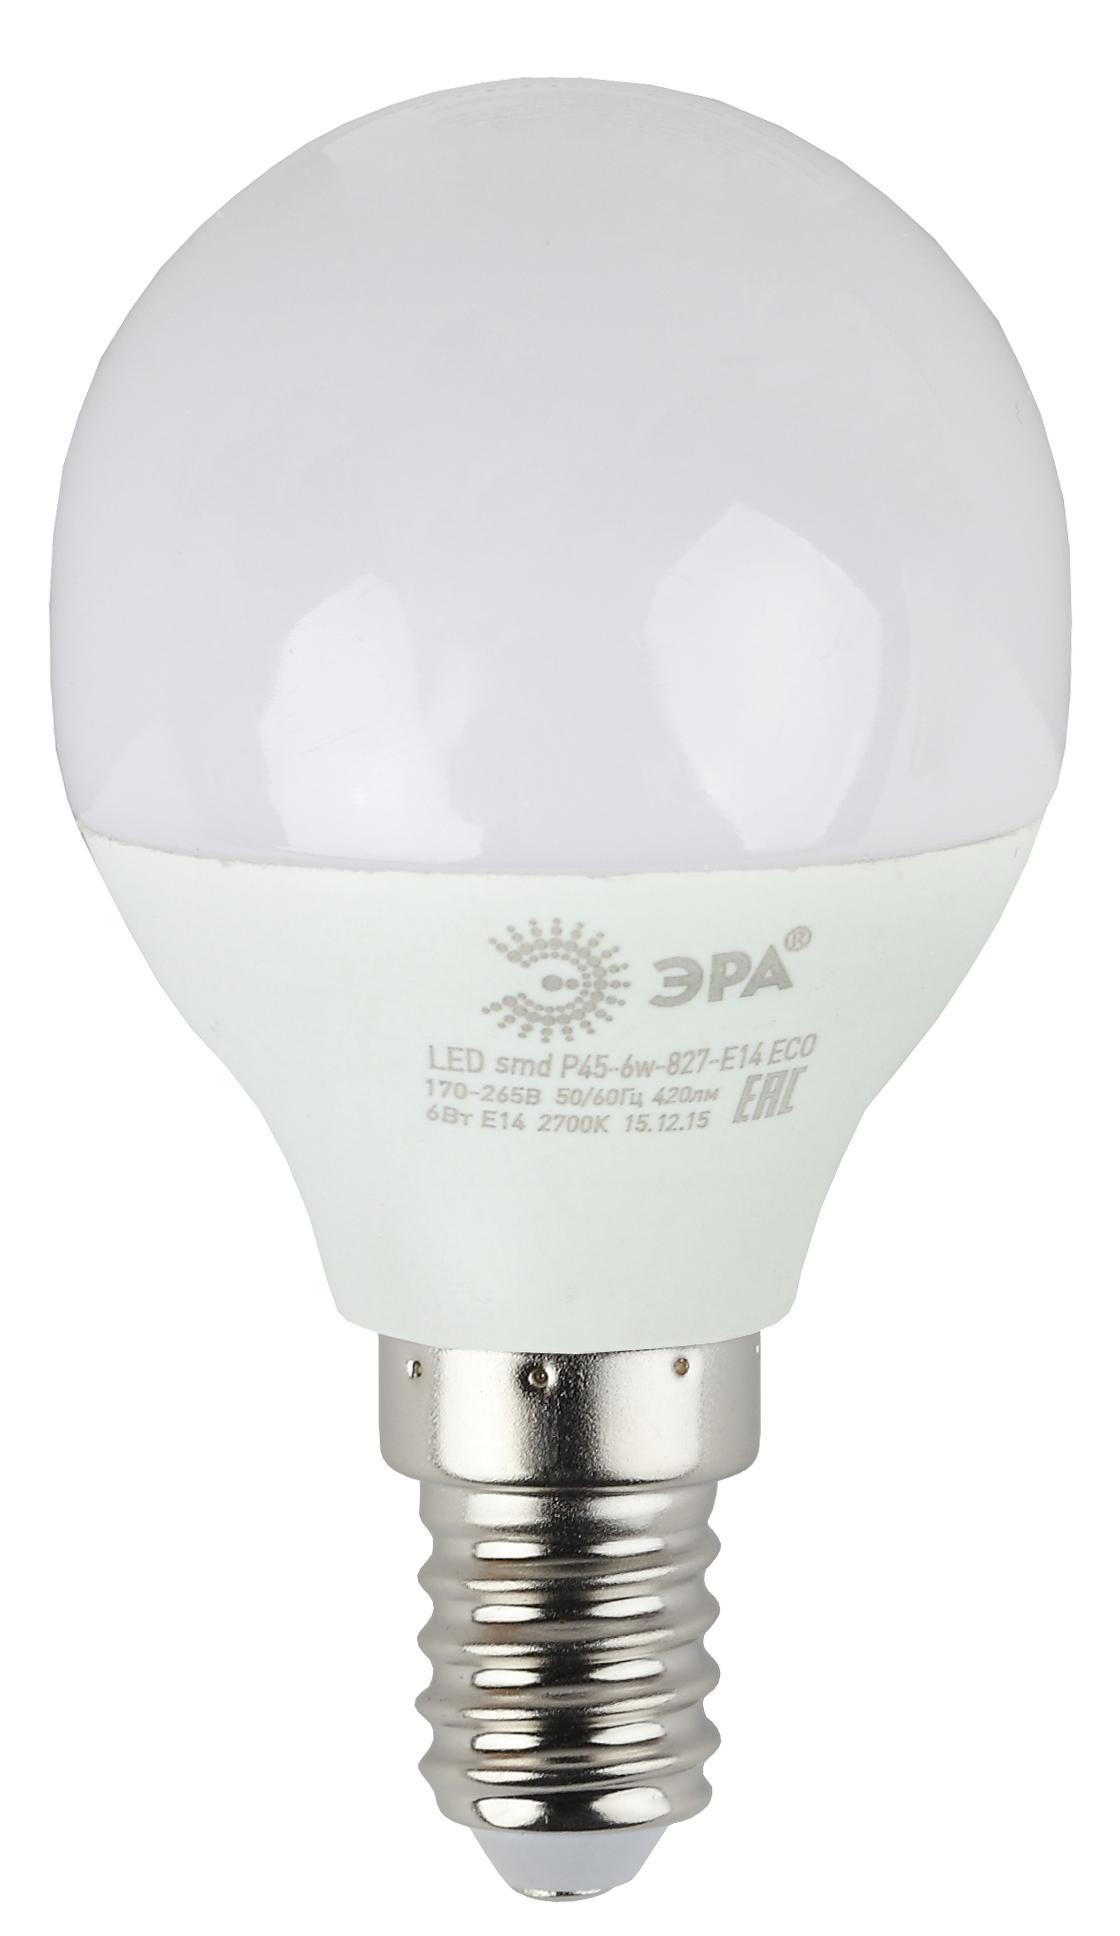 Лампа светодиодная ЭРА Led smd Р45-6w-840-e14_eco